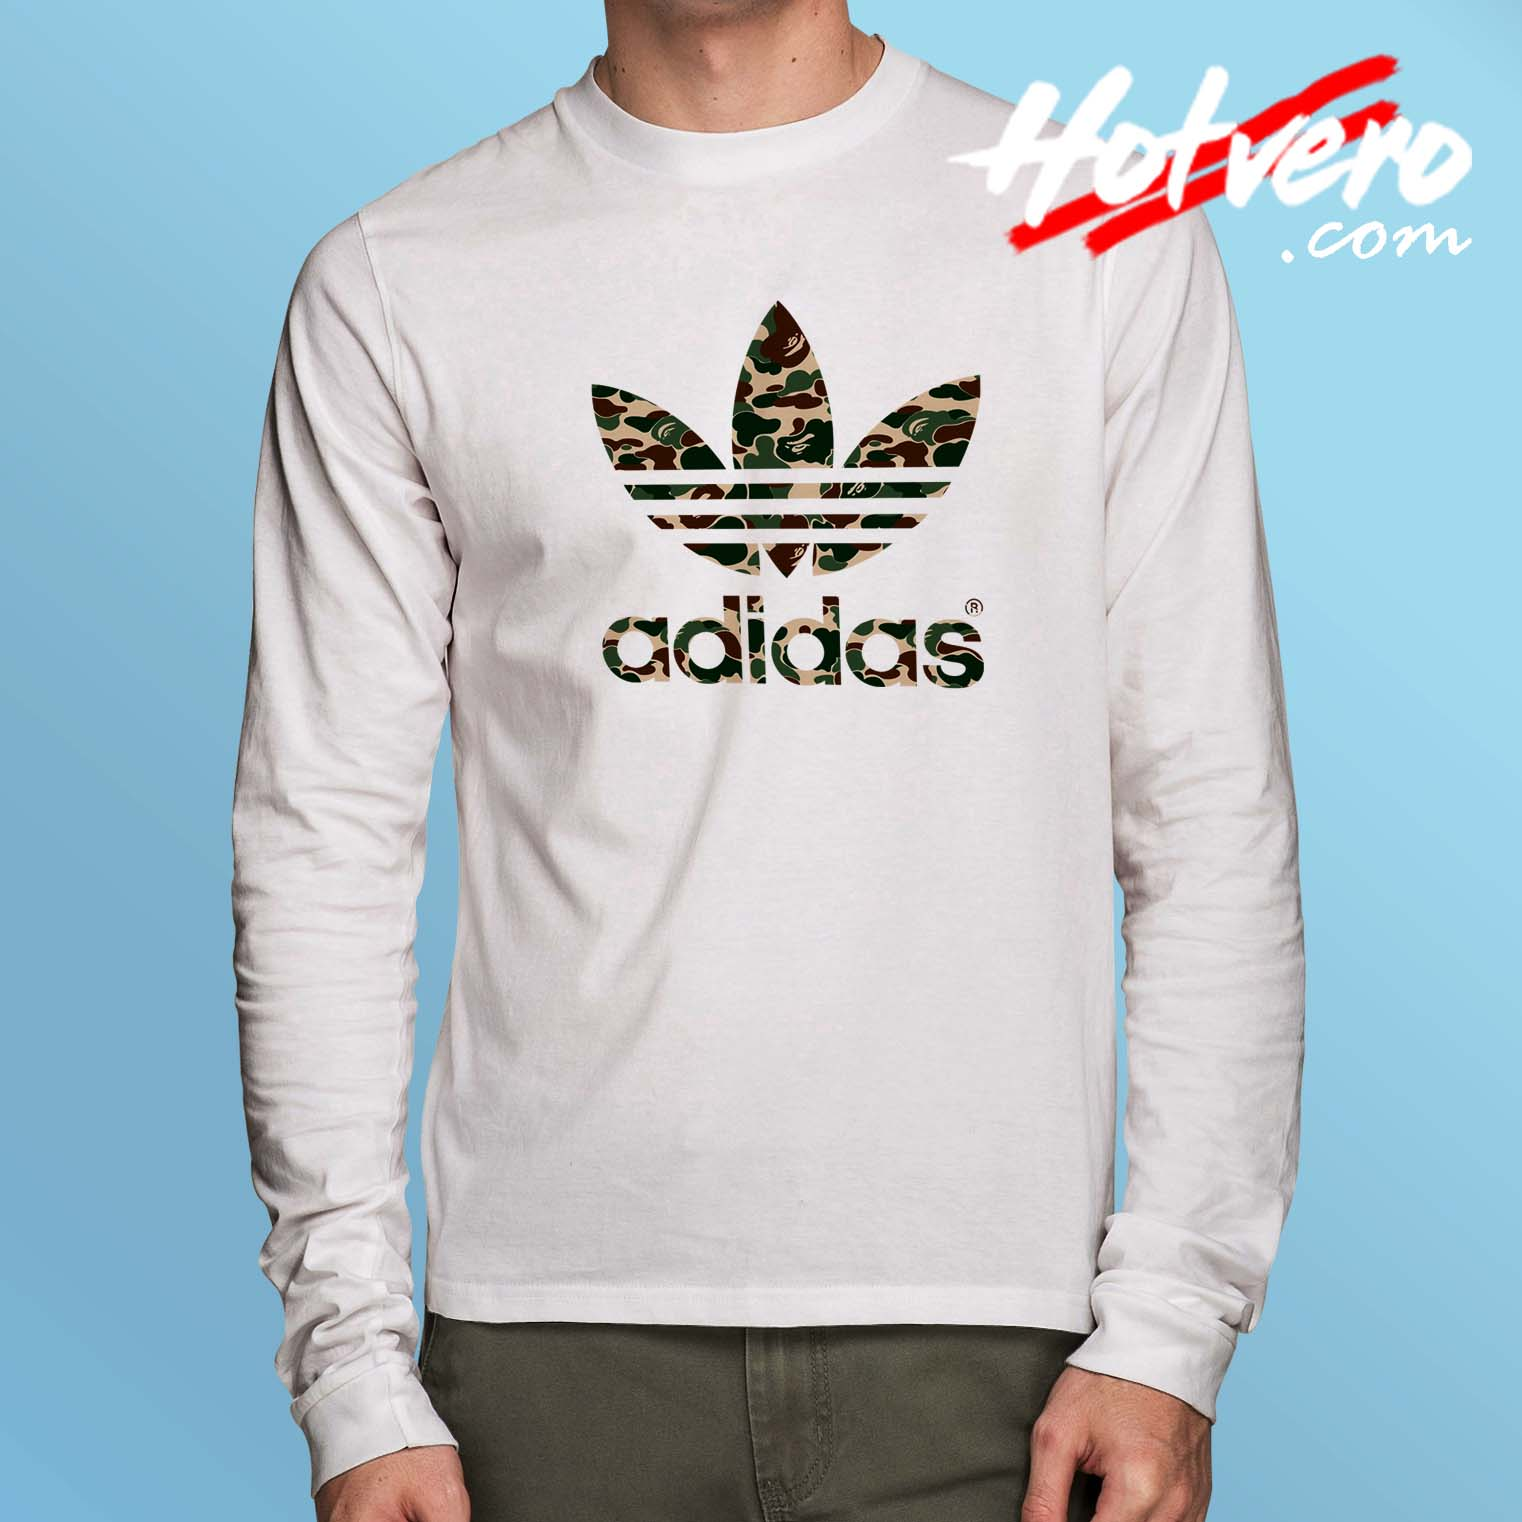 2705ec0c Cheap Bape Camo Adidas Collabs Long Sleeve Shirt - Hotvero.com